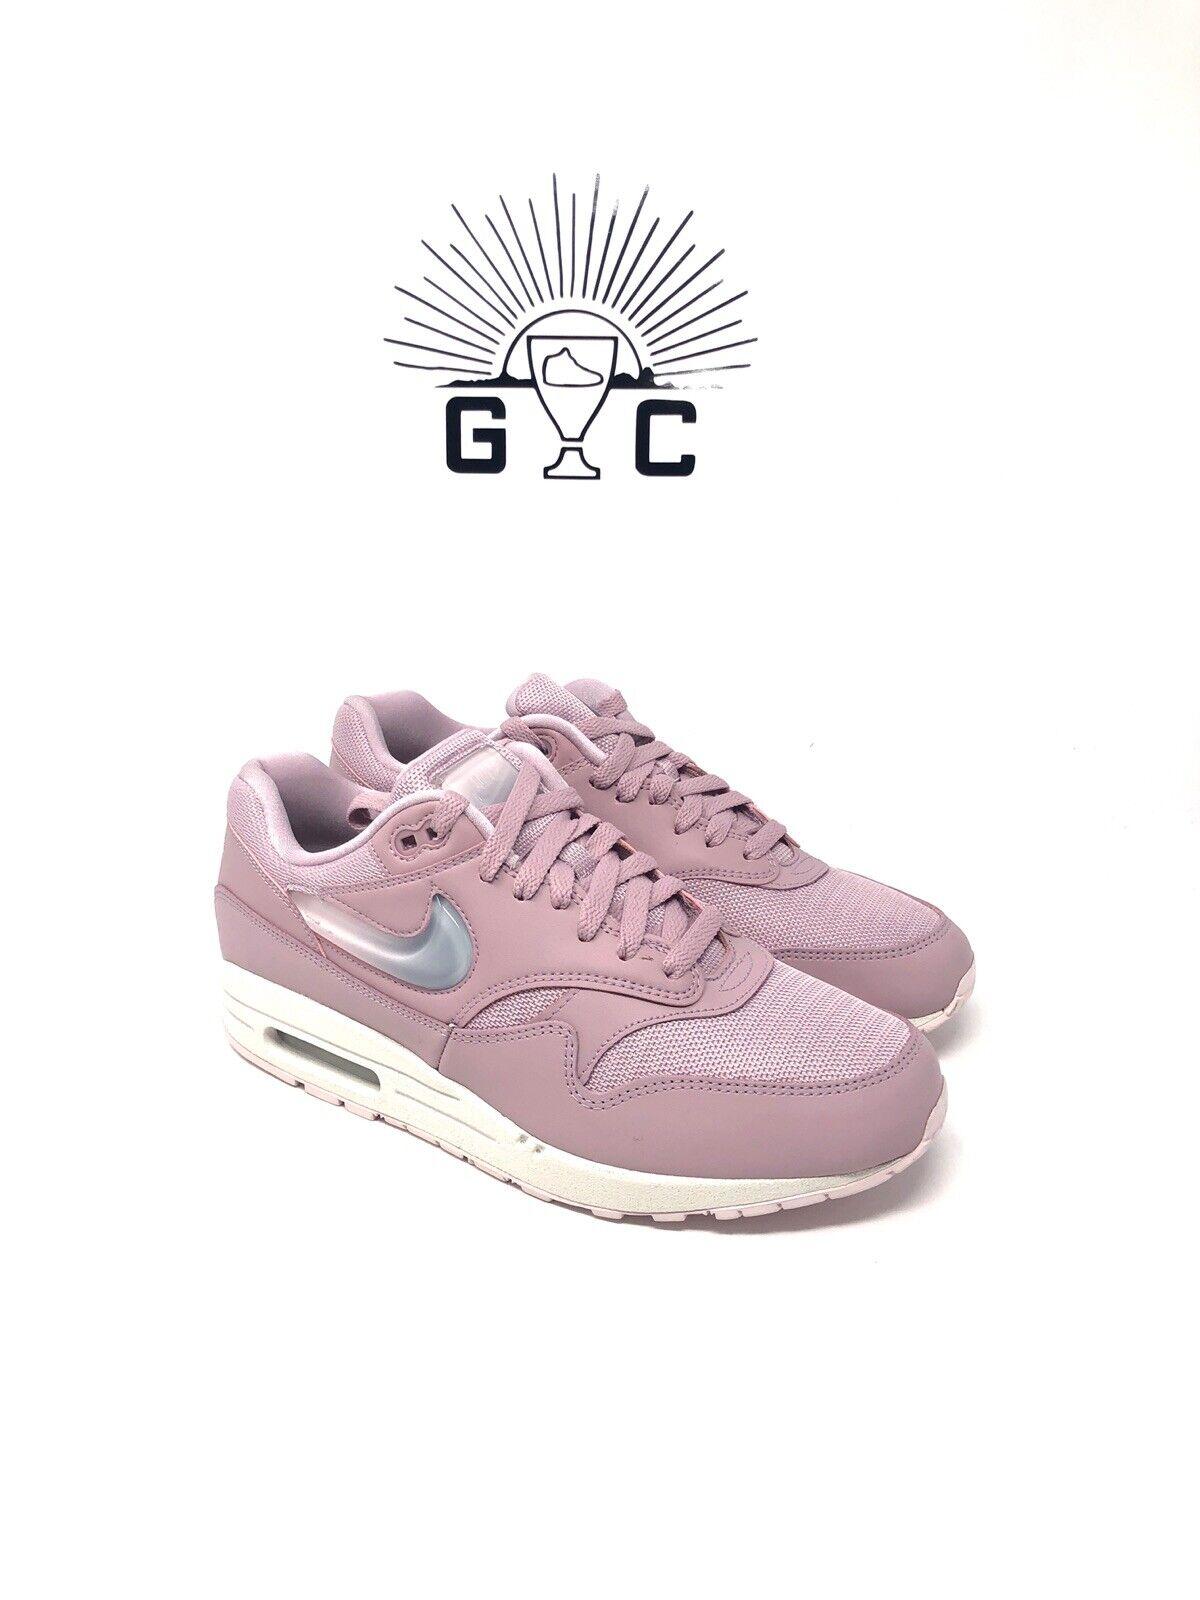 "Brand New Nike Air Max 1 W ""Plum Pink Obsidian"" DS Womens Size 10.5W"